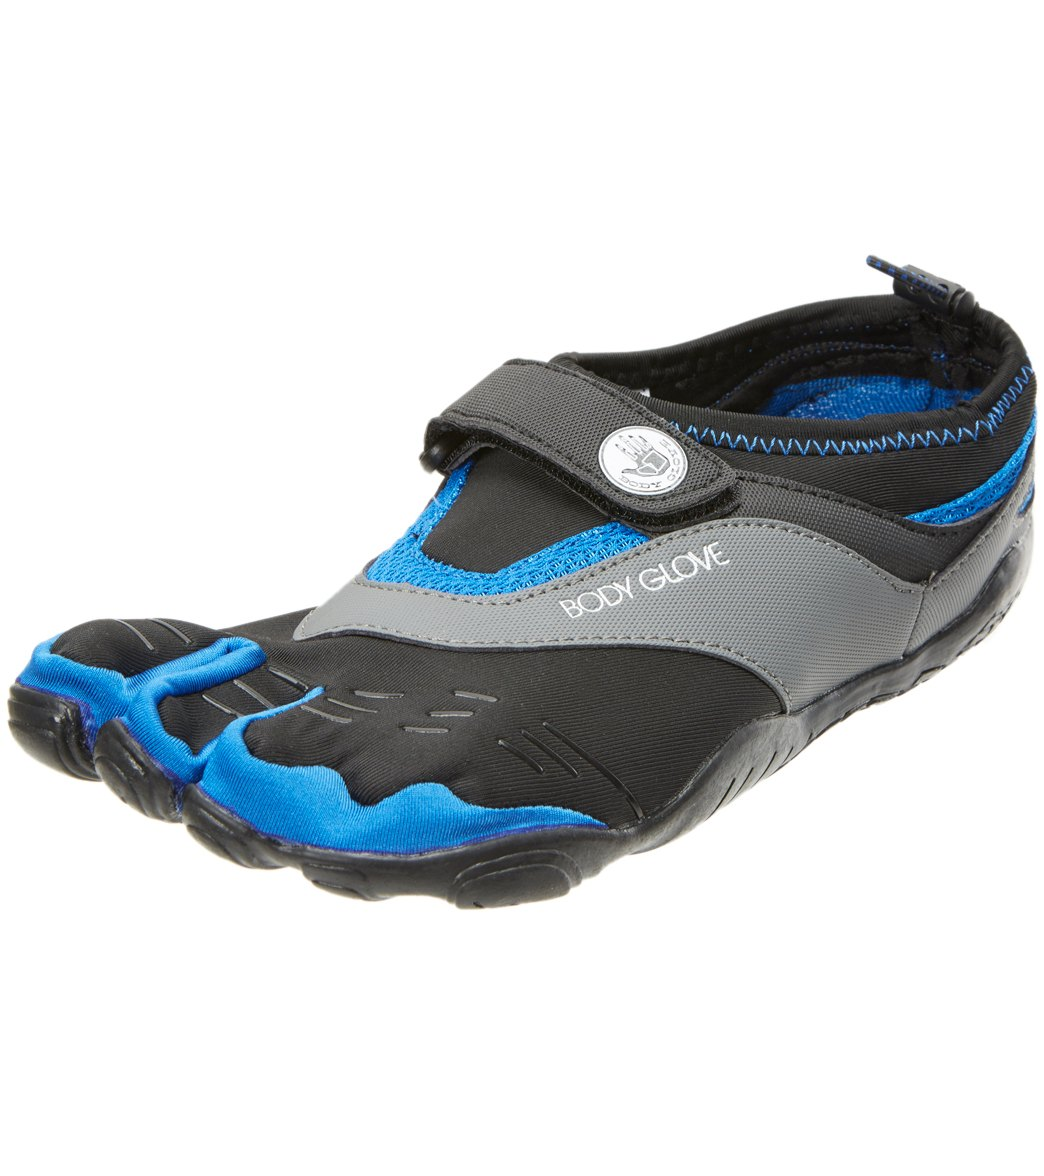 e5f759921f86 Body Glove Men s 3T Max Water Shoe at SwimOutlet.com - Free Shipping